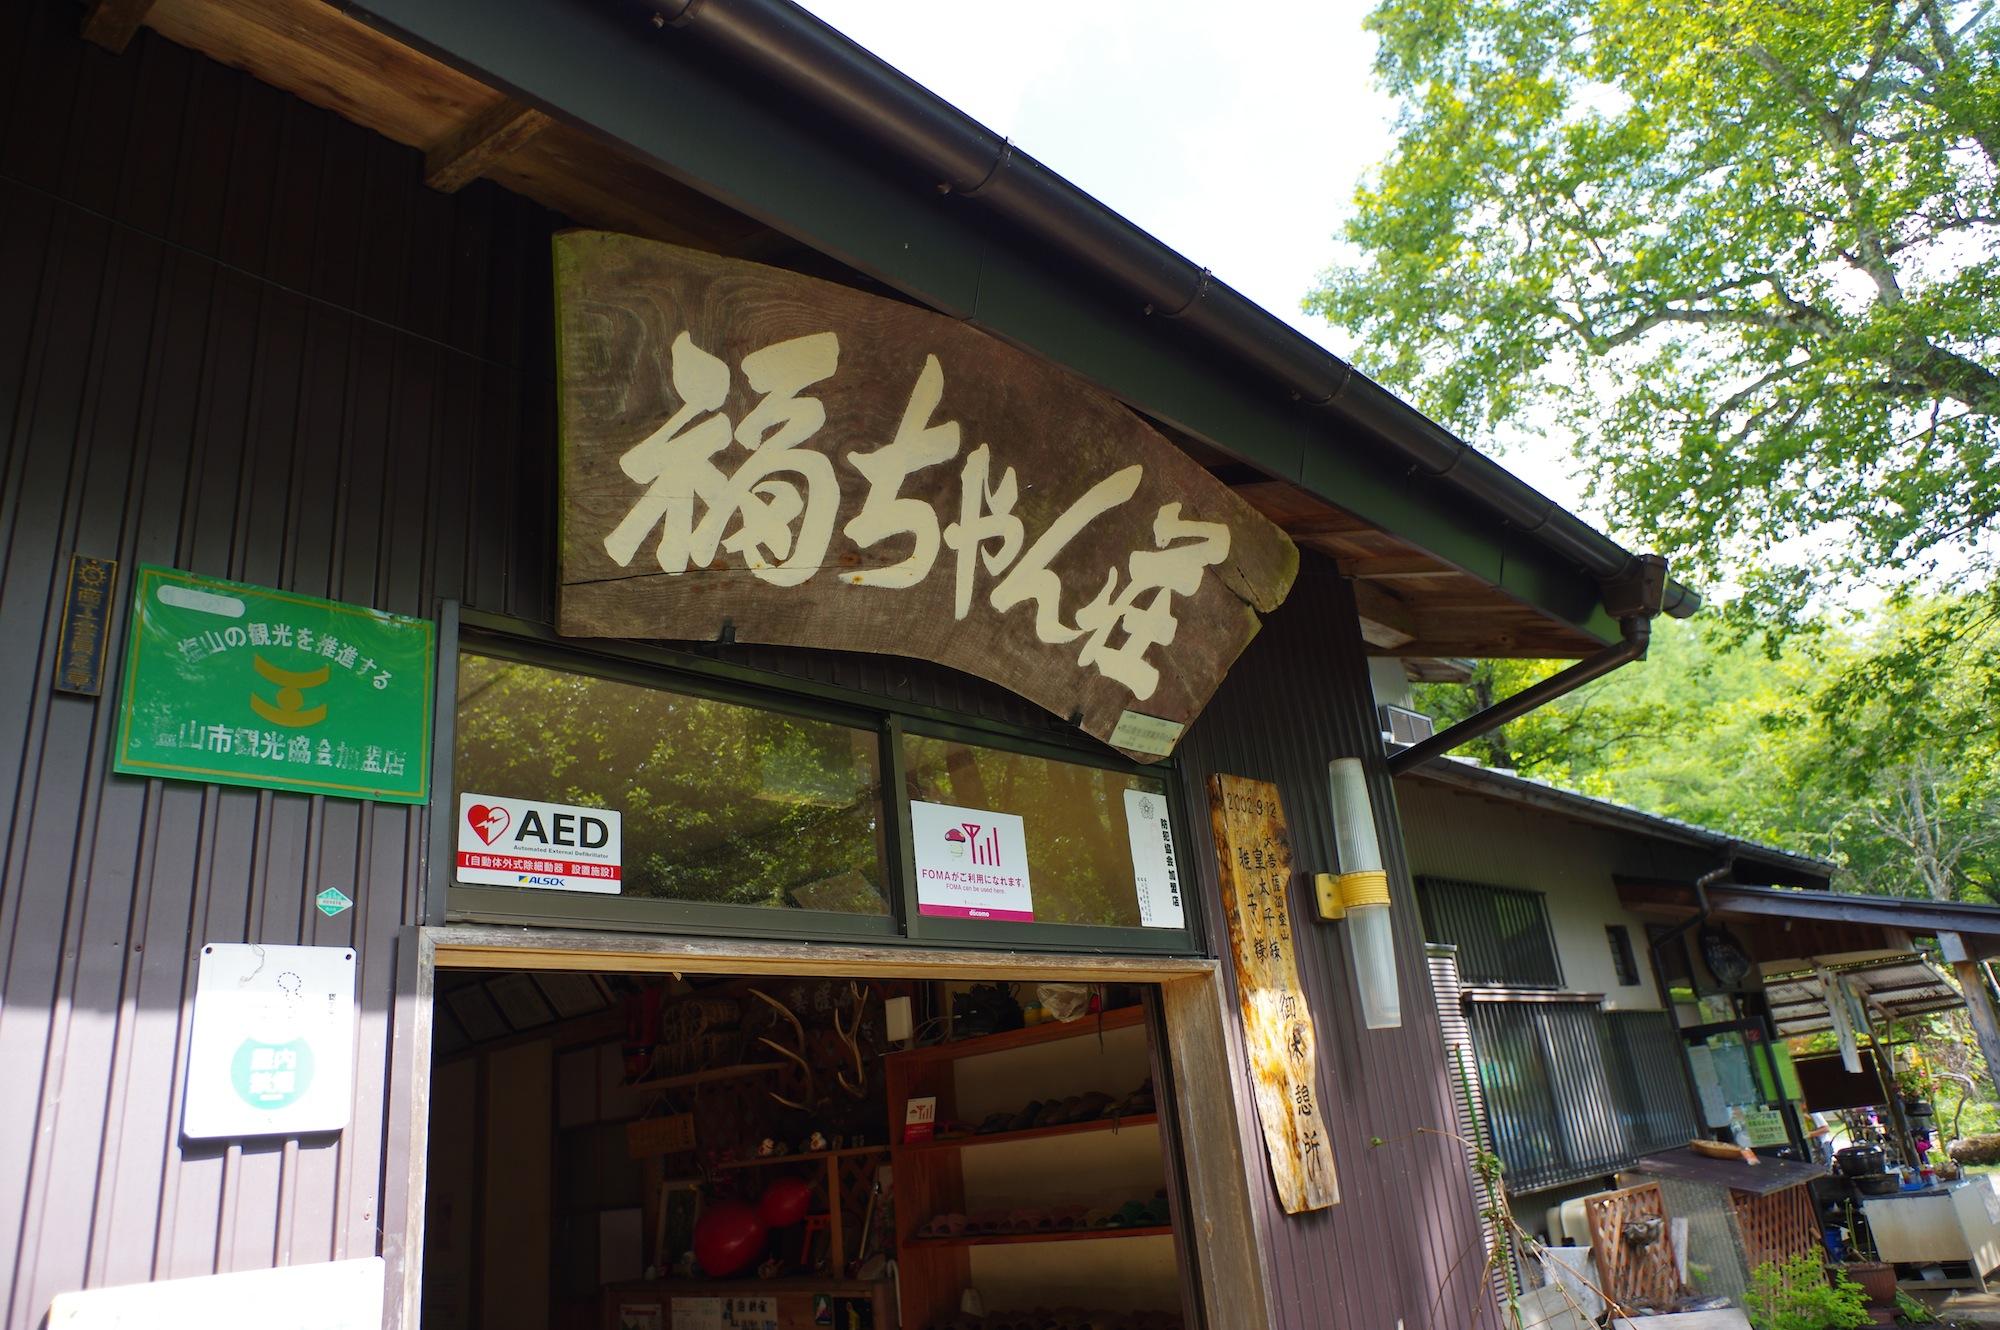 f:id:sakemaro:20150621233402j:plain